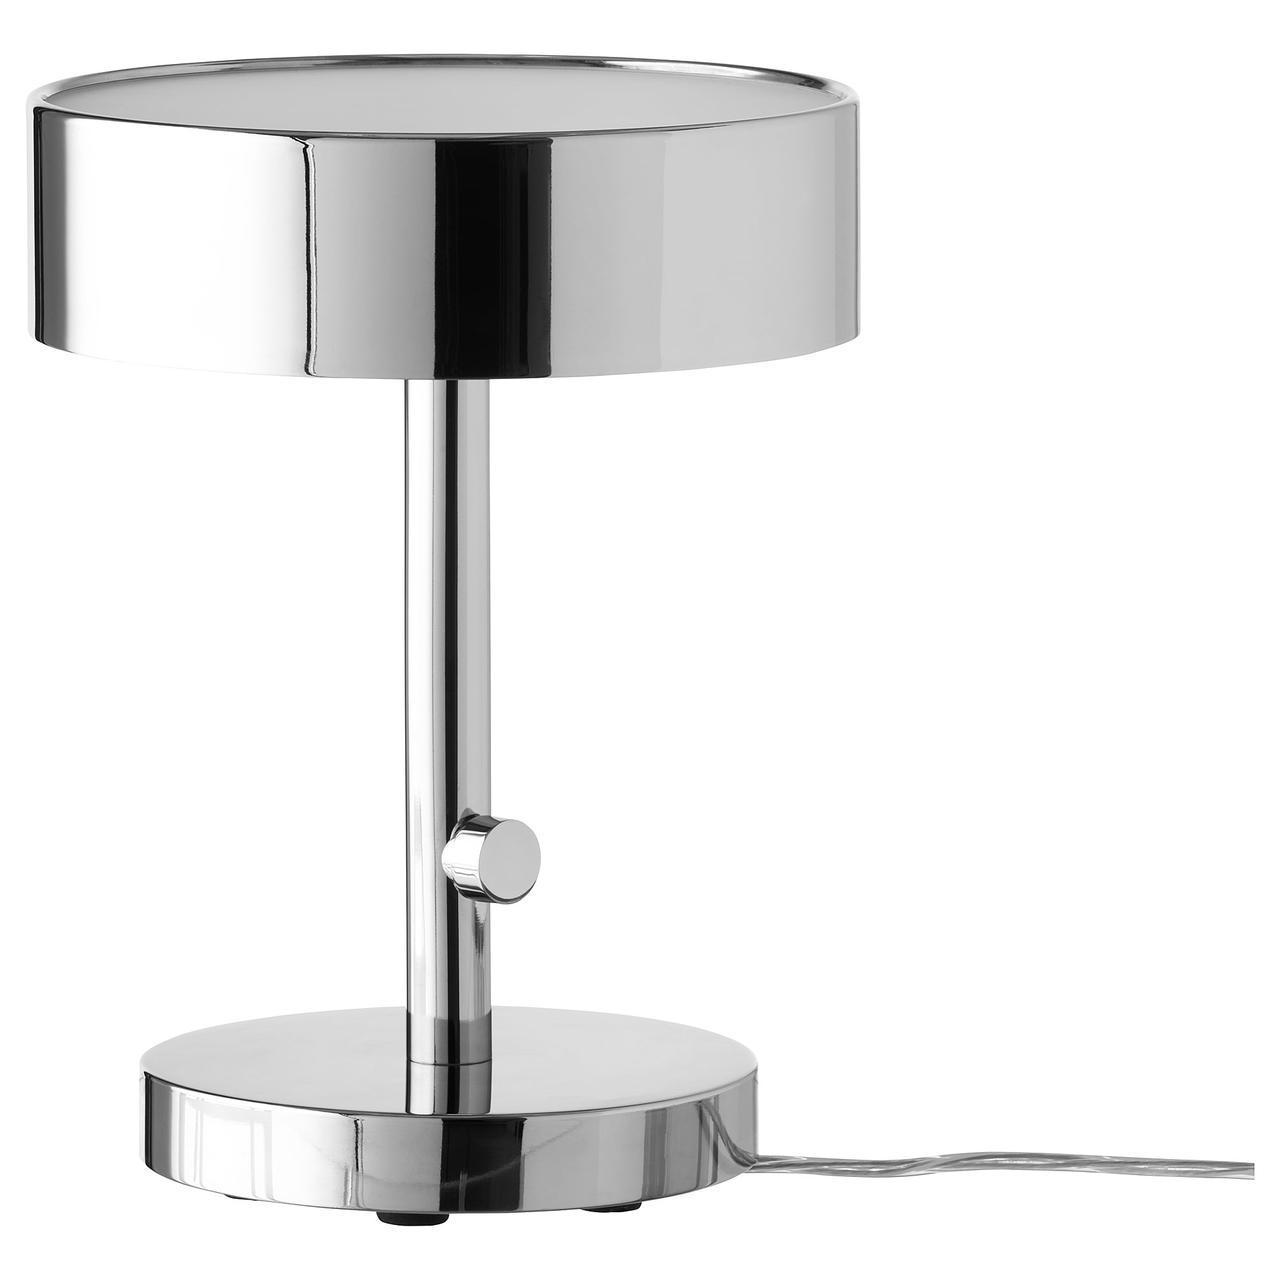 IKEA STOCKHOLM2017 Наcтольная лампа, хром  (303.435.39)